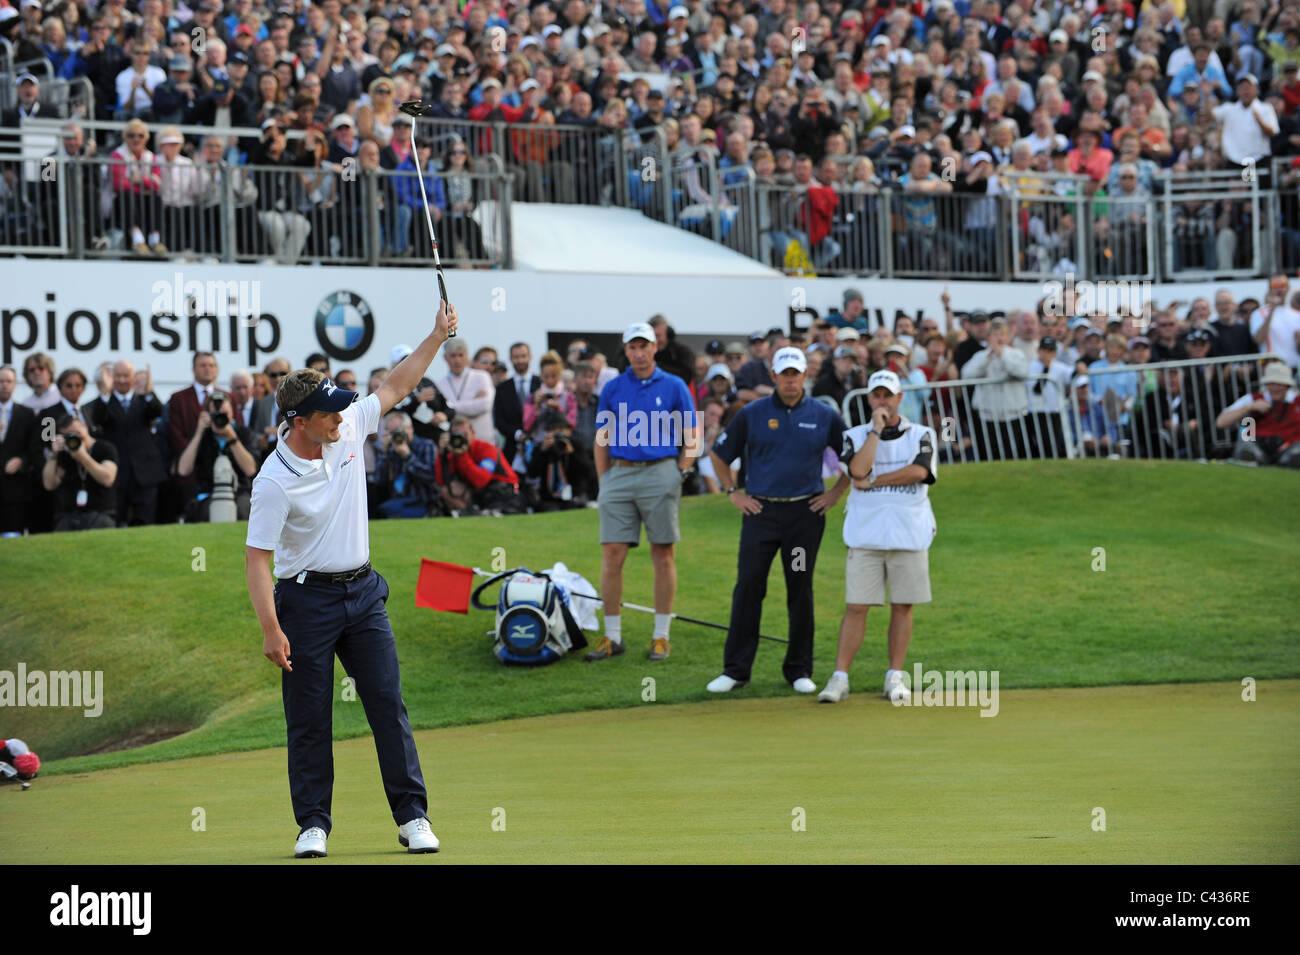 Golfer Luke Donald celebrates winning the 2011 BMW PGA Championships - Stock Image